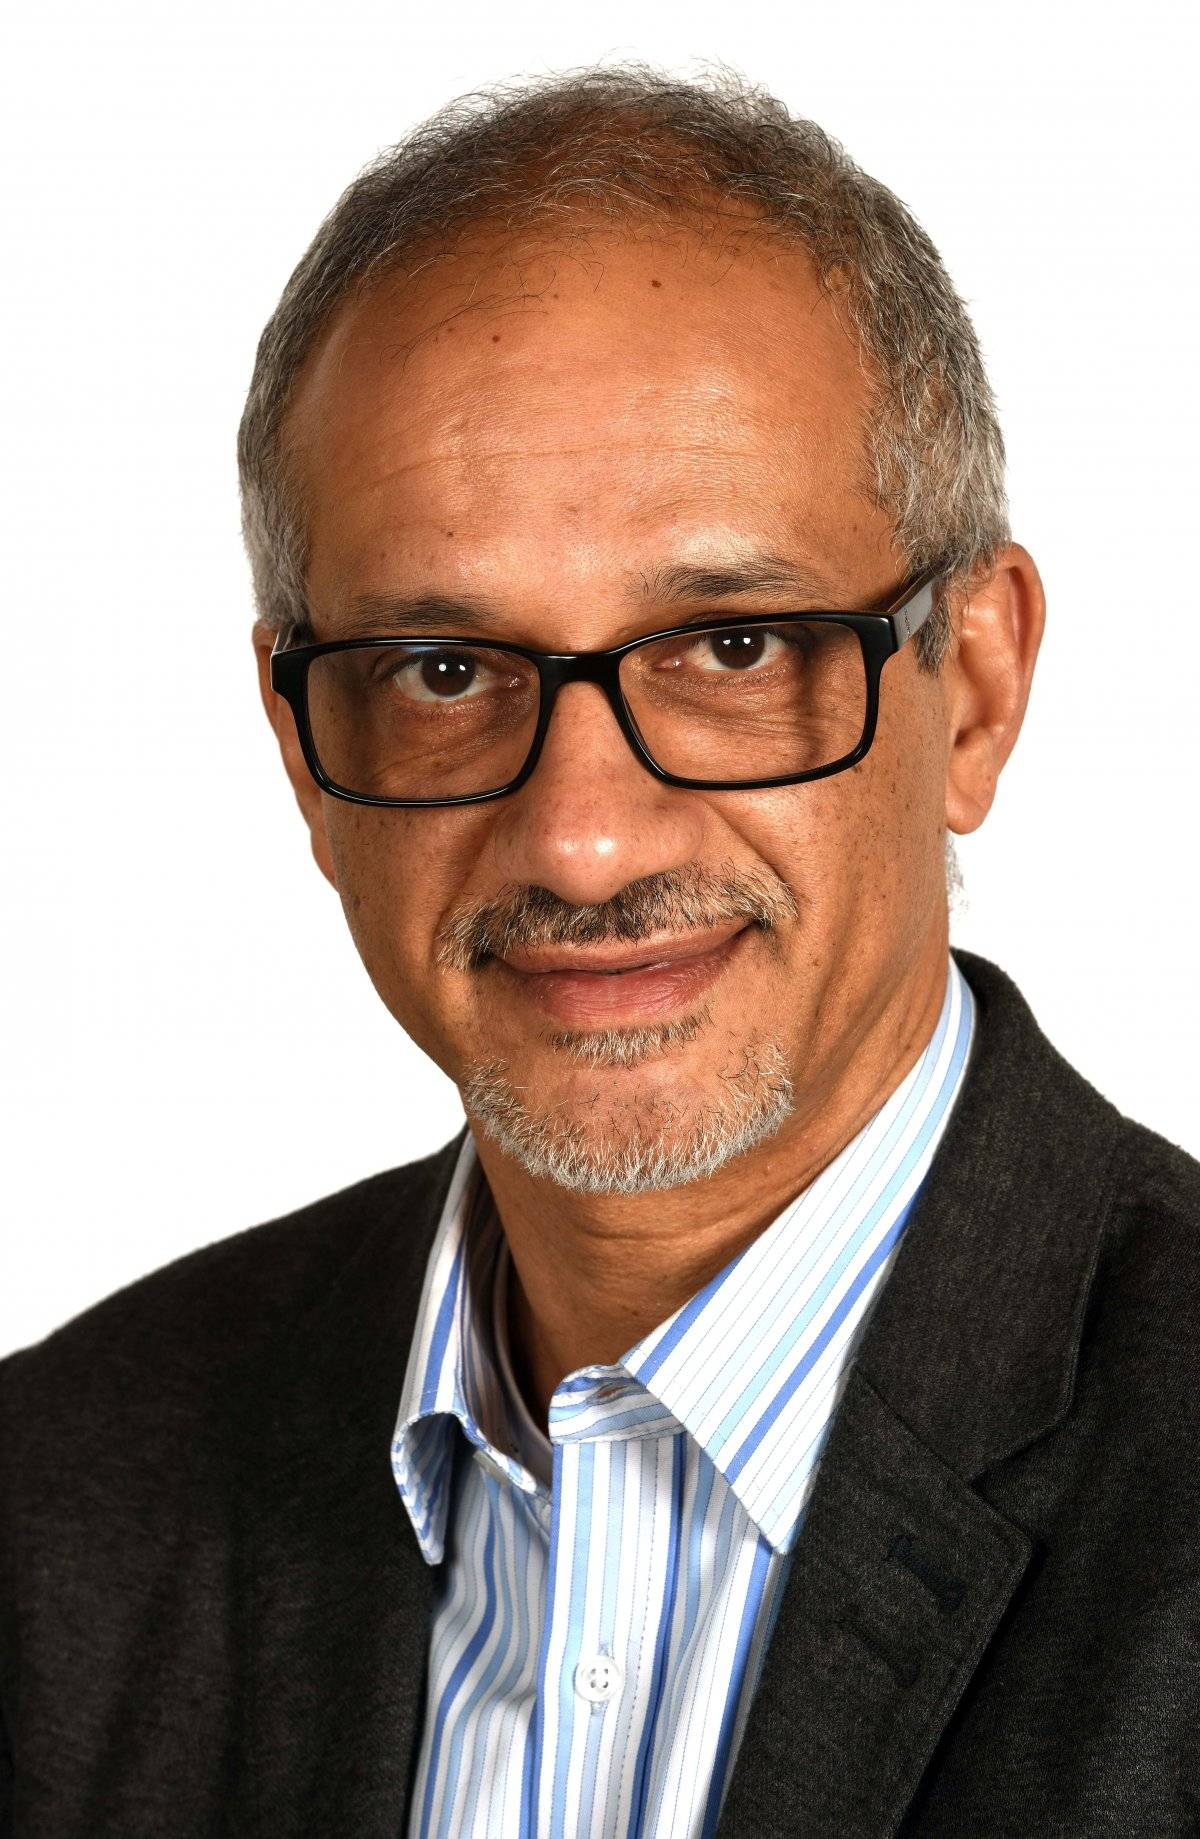 Alfredo Saad Filho, profesor de economía política en SOAS University of London, Reino Unido